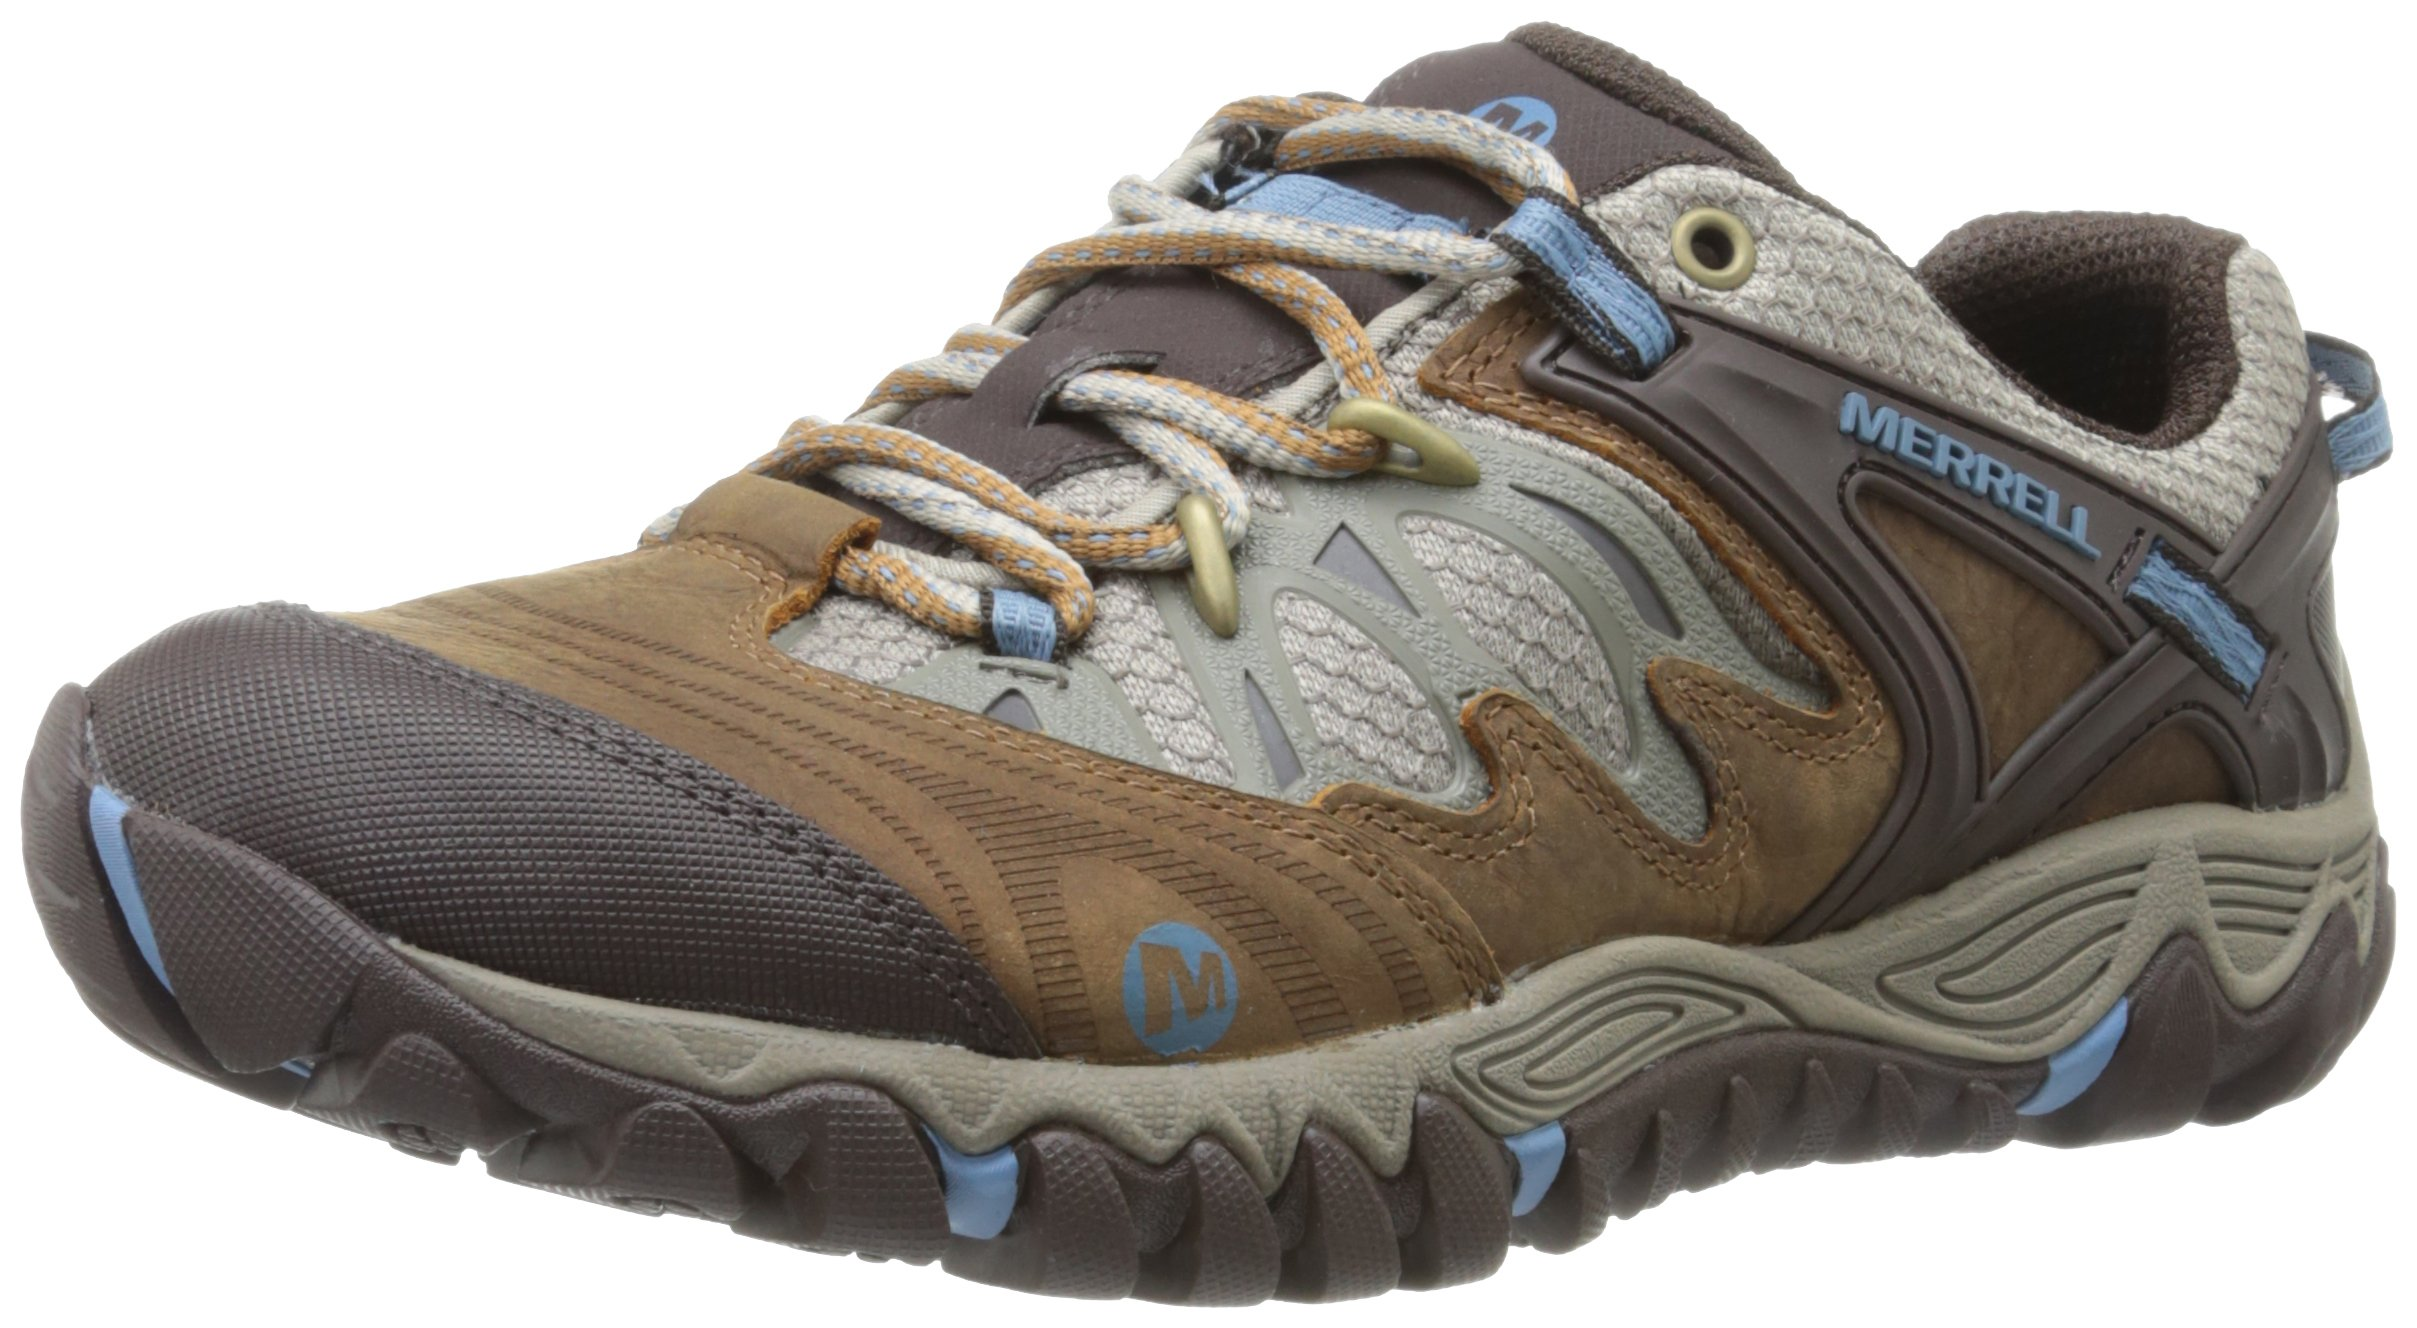 Merrell Women's All Out Blaze Hiking Shoe,Brown Sugar/Blue Heaven,8.5 M US